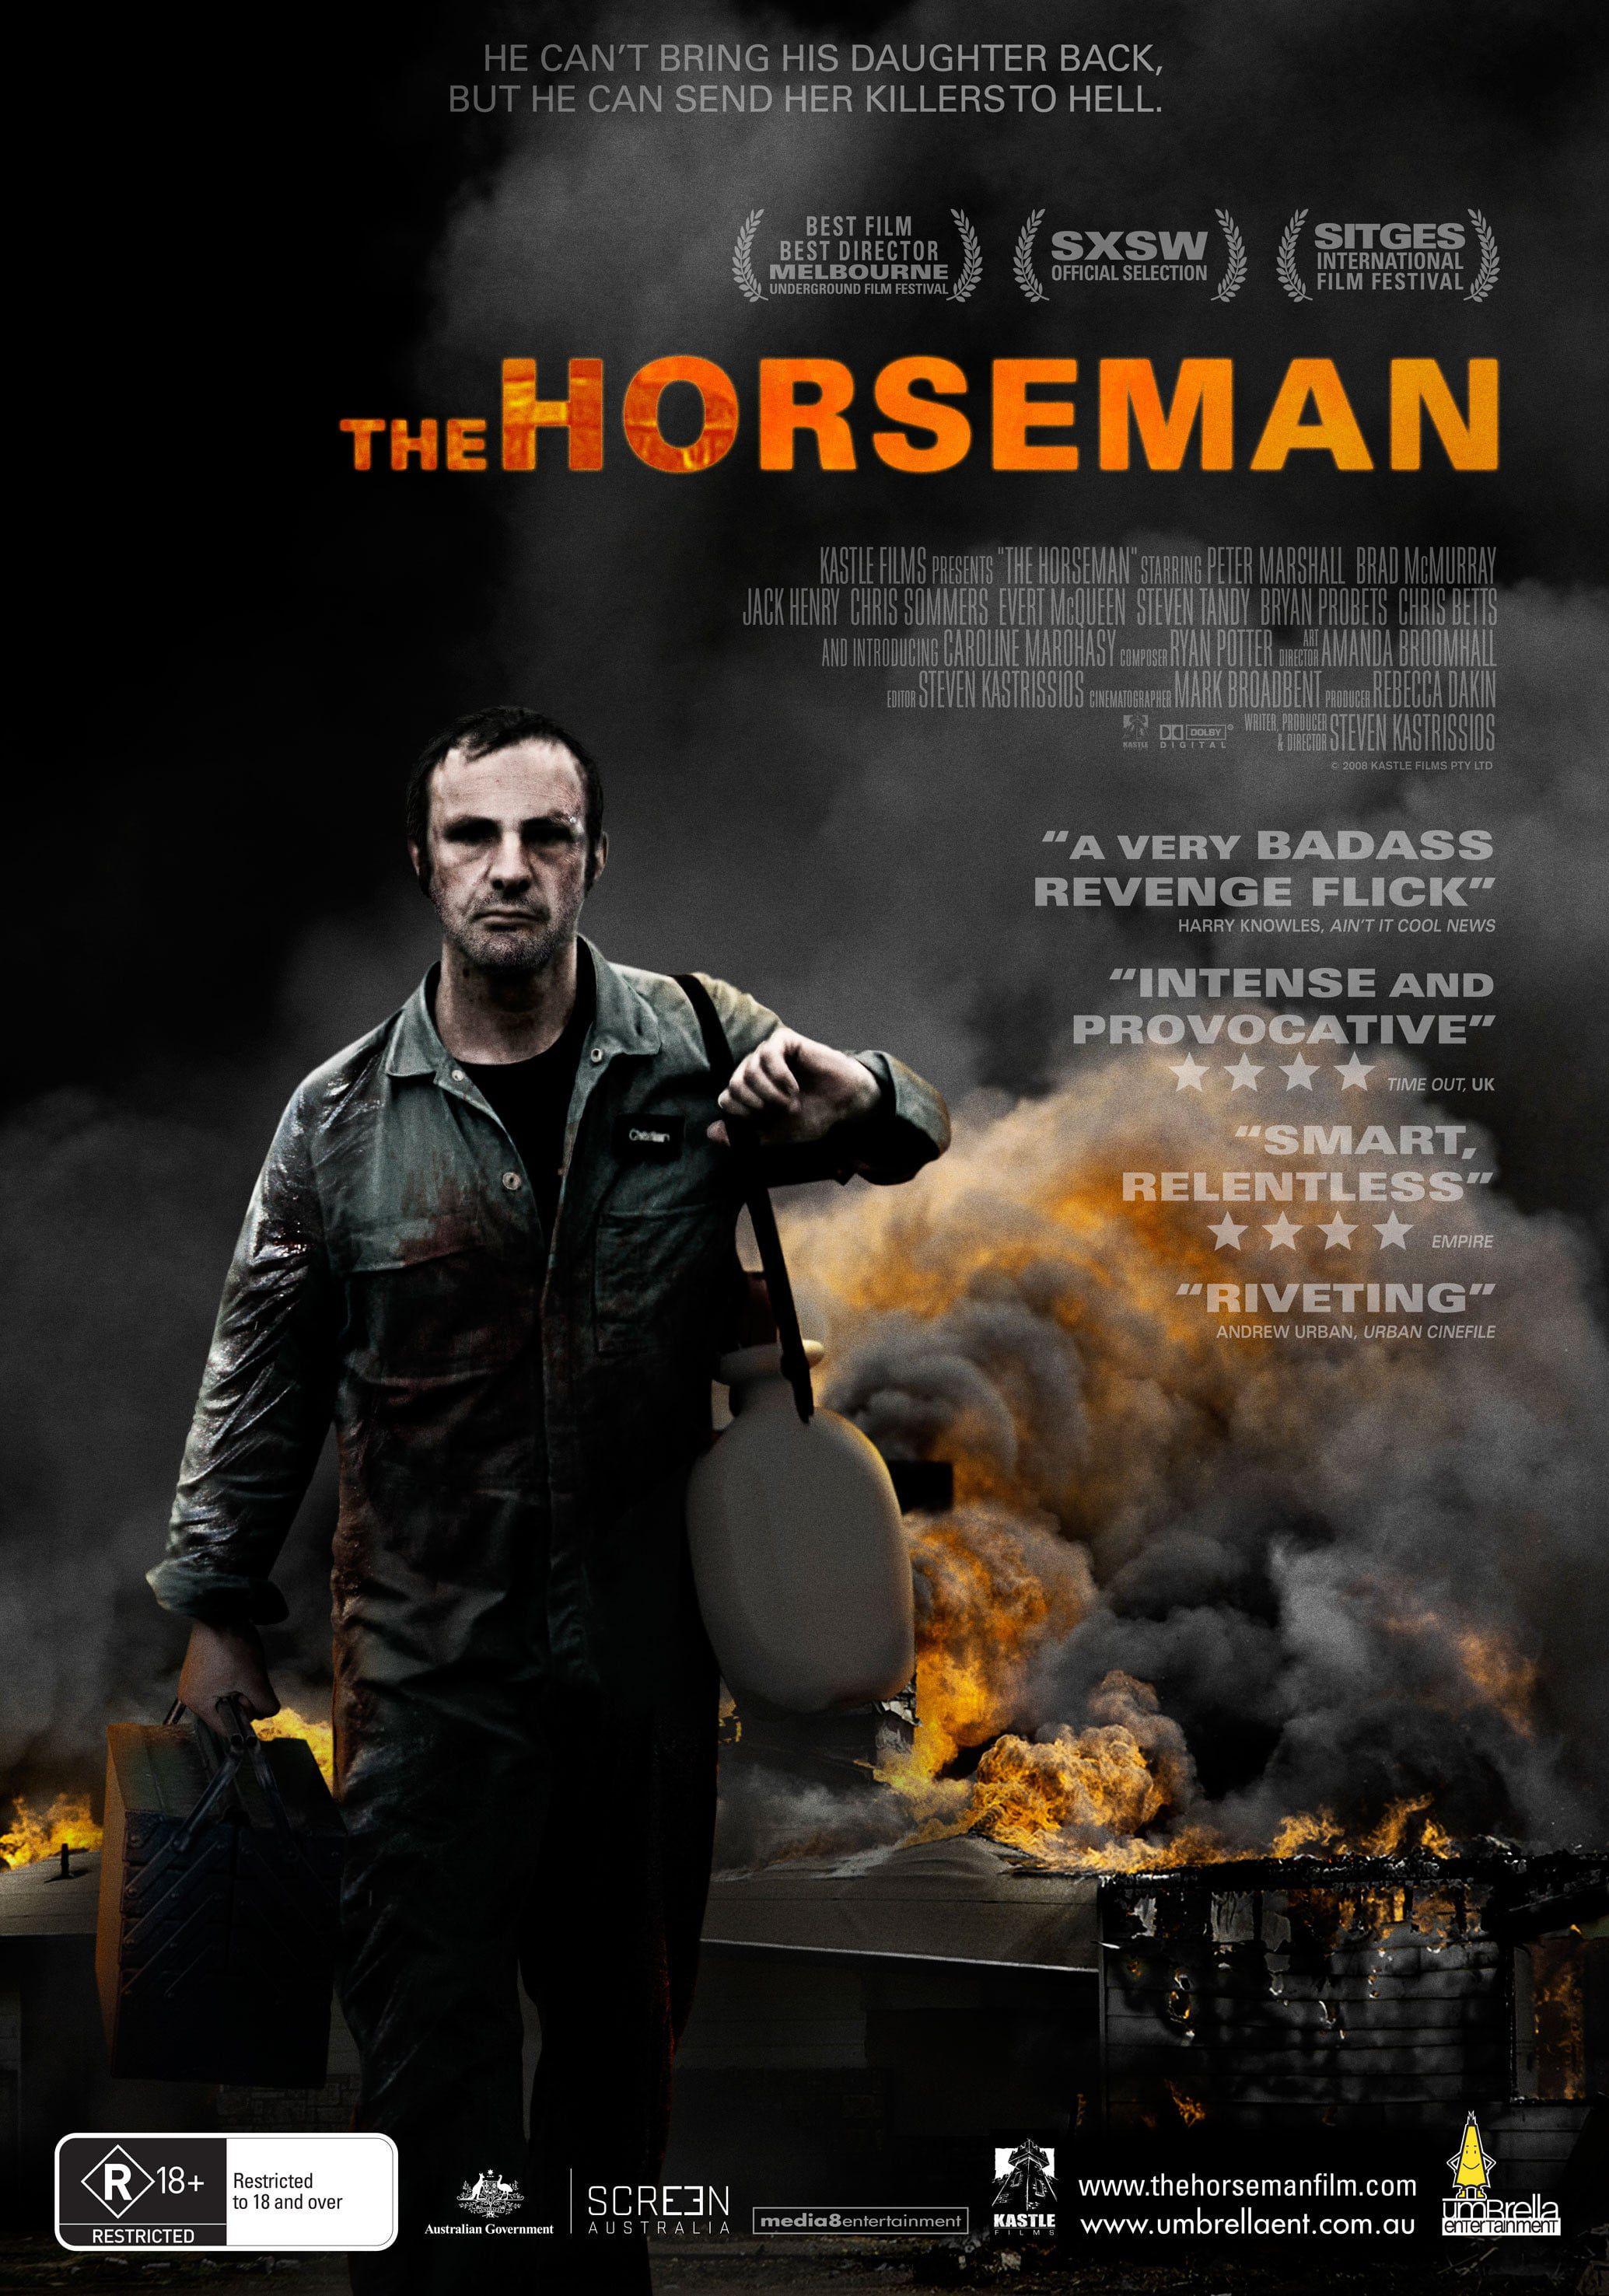 The Horseman - Film (2008)